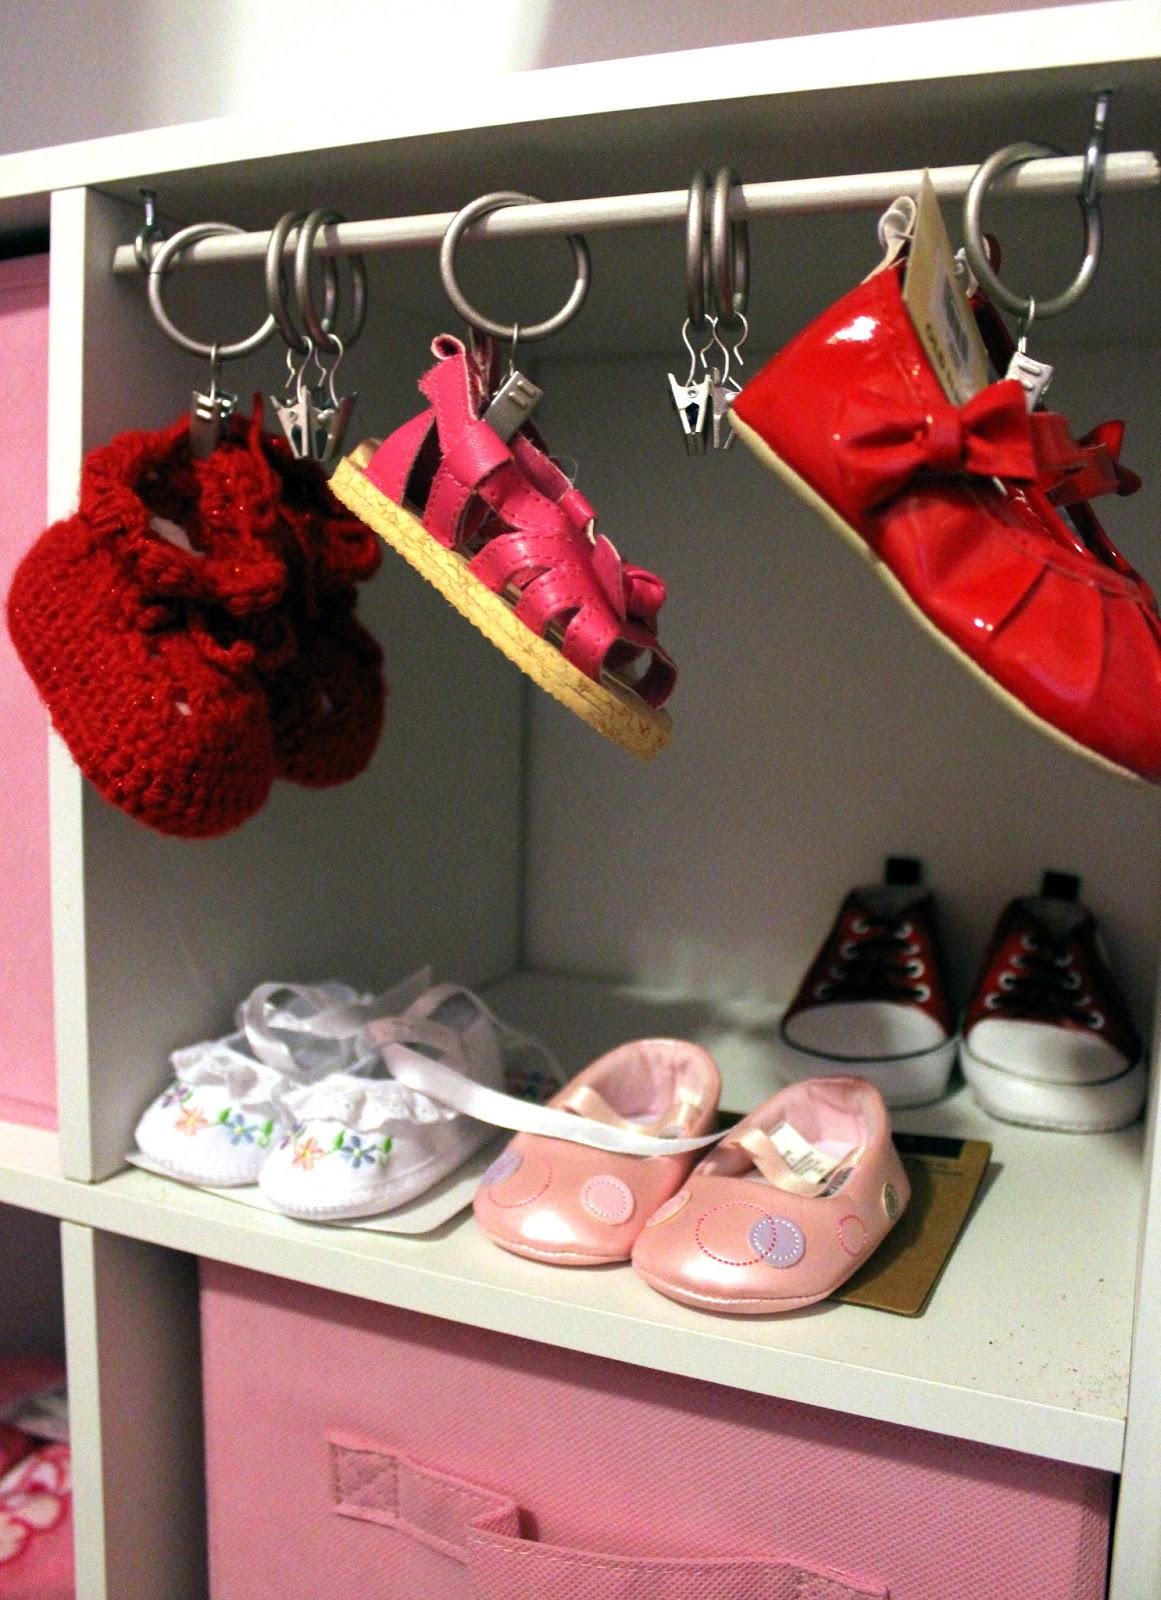 Dibble dabbles nursery itty bitty baby shoes - Baby shoe organizer ideas ...